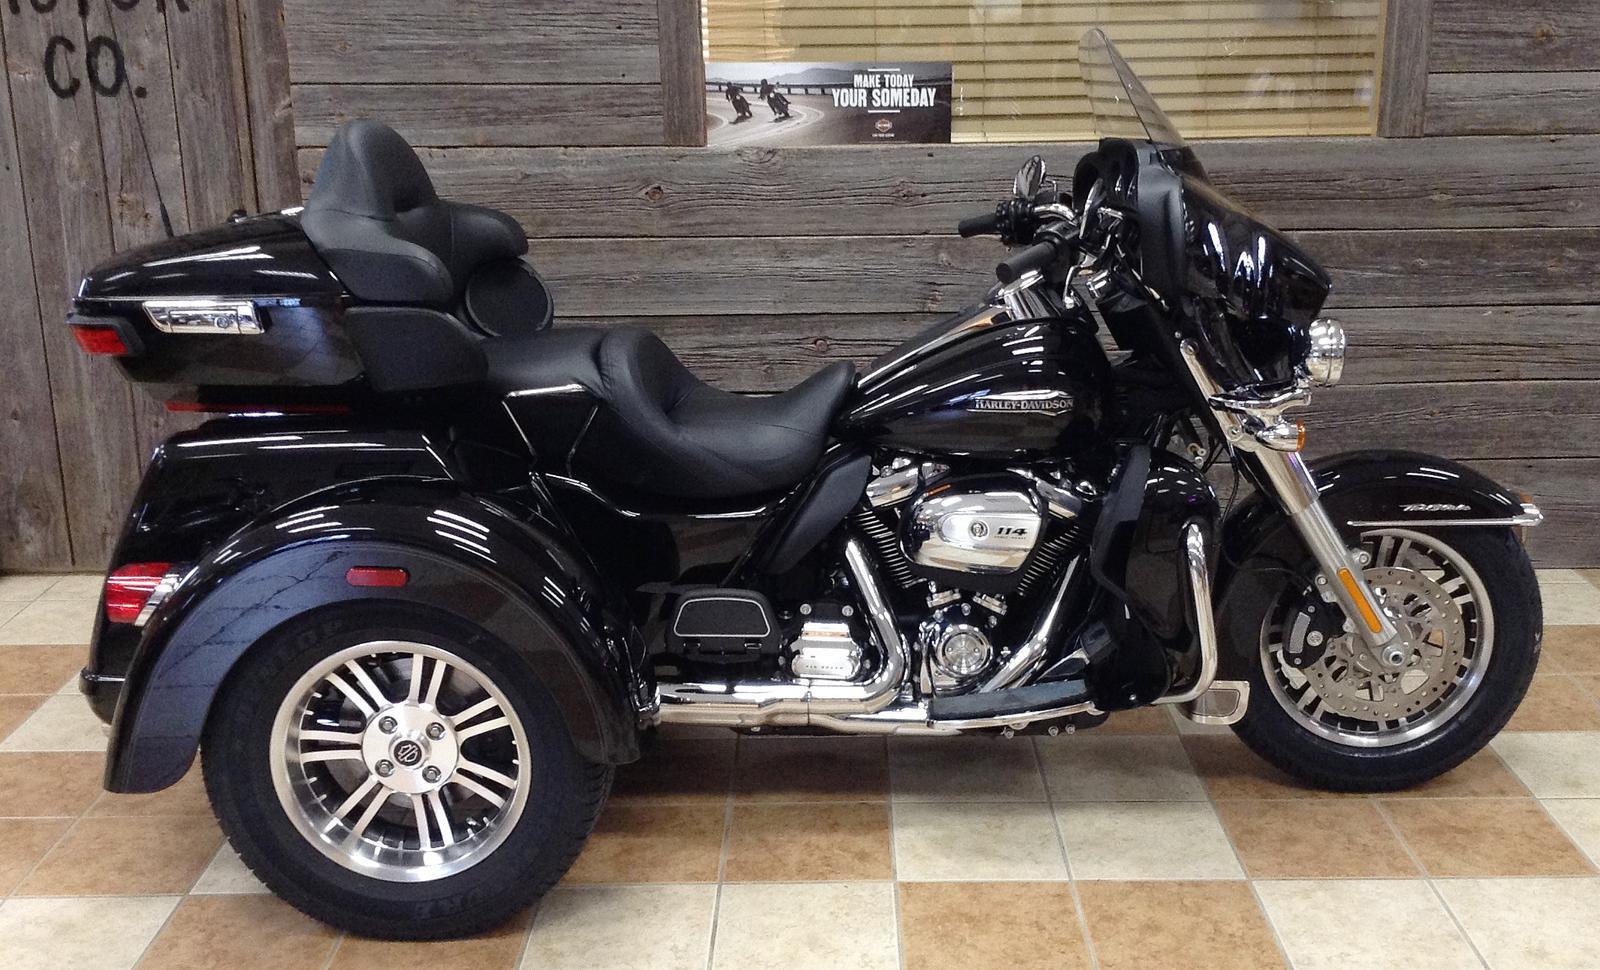 206b820d30 2019 Harley-Davidson® FLHTCUTG Tri Glide® Ultra Classic® - Doc s Harley- Davidson of Shawano County